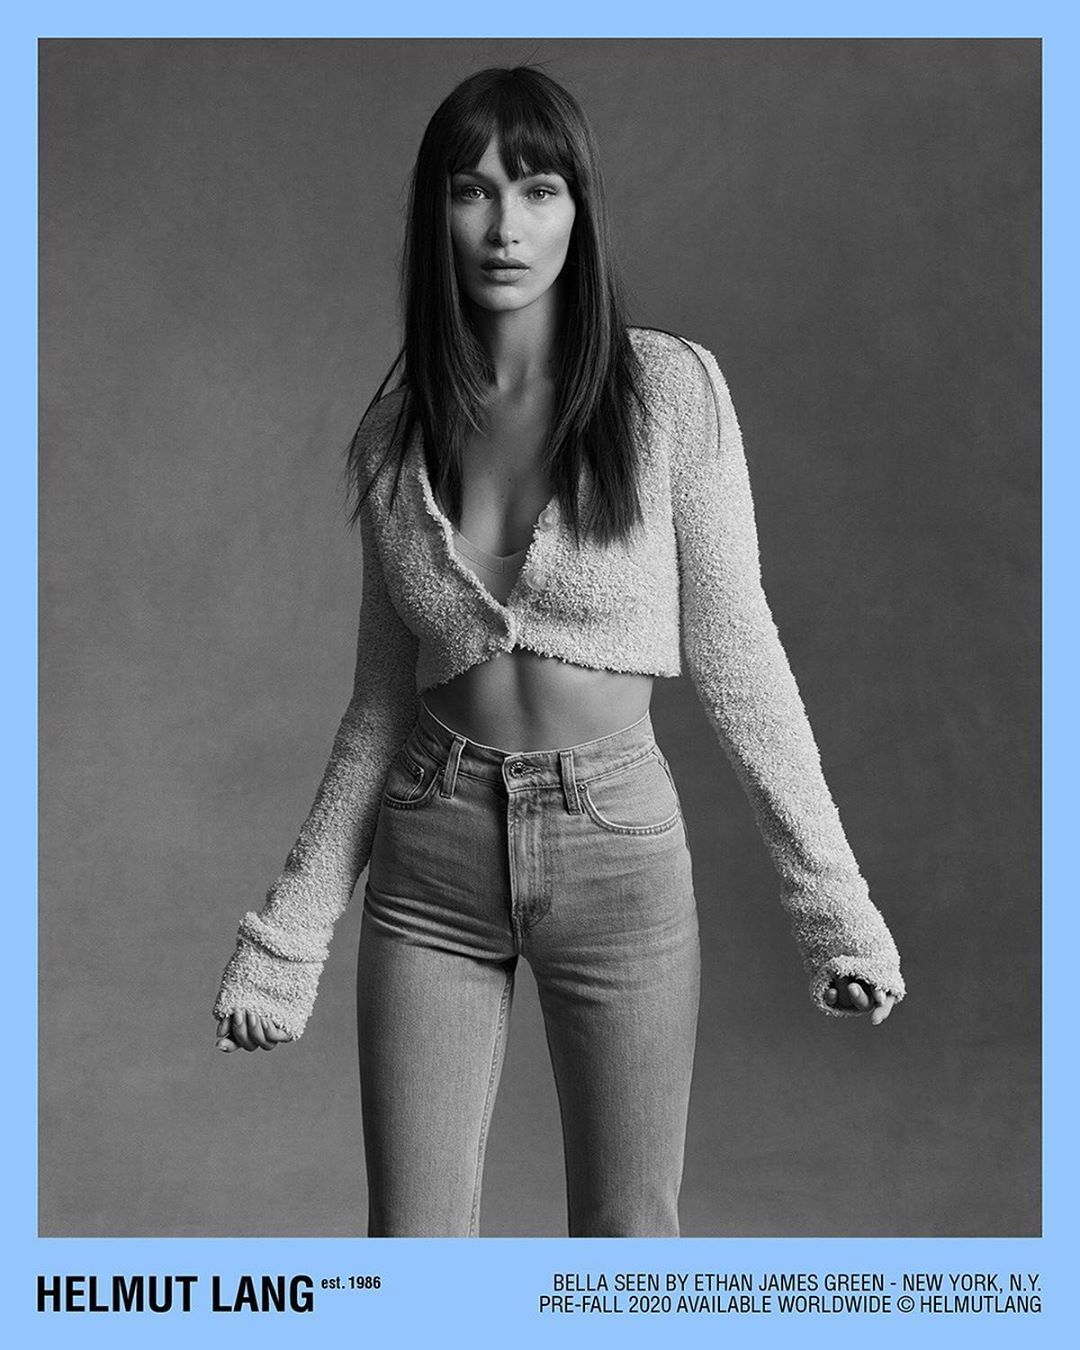 Bella Hadid为Helmut Lang拍摄的最新广告大片我晕 黑白好美 曲线好